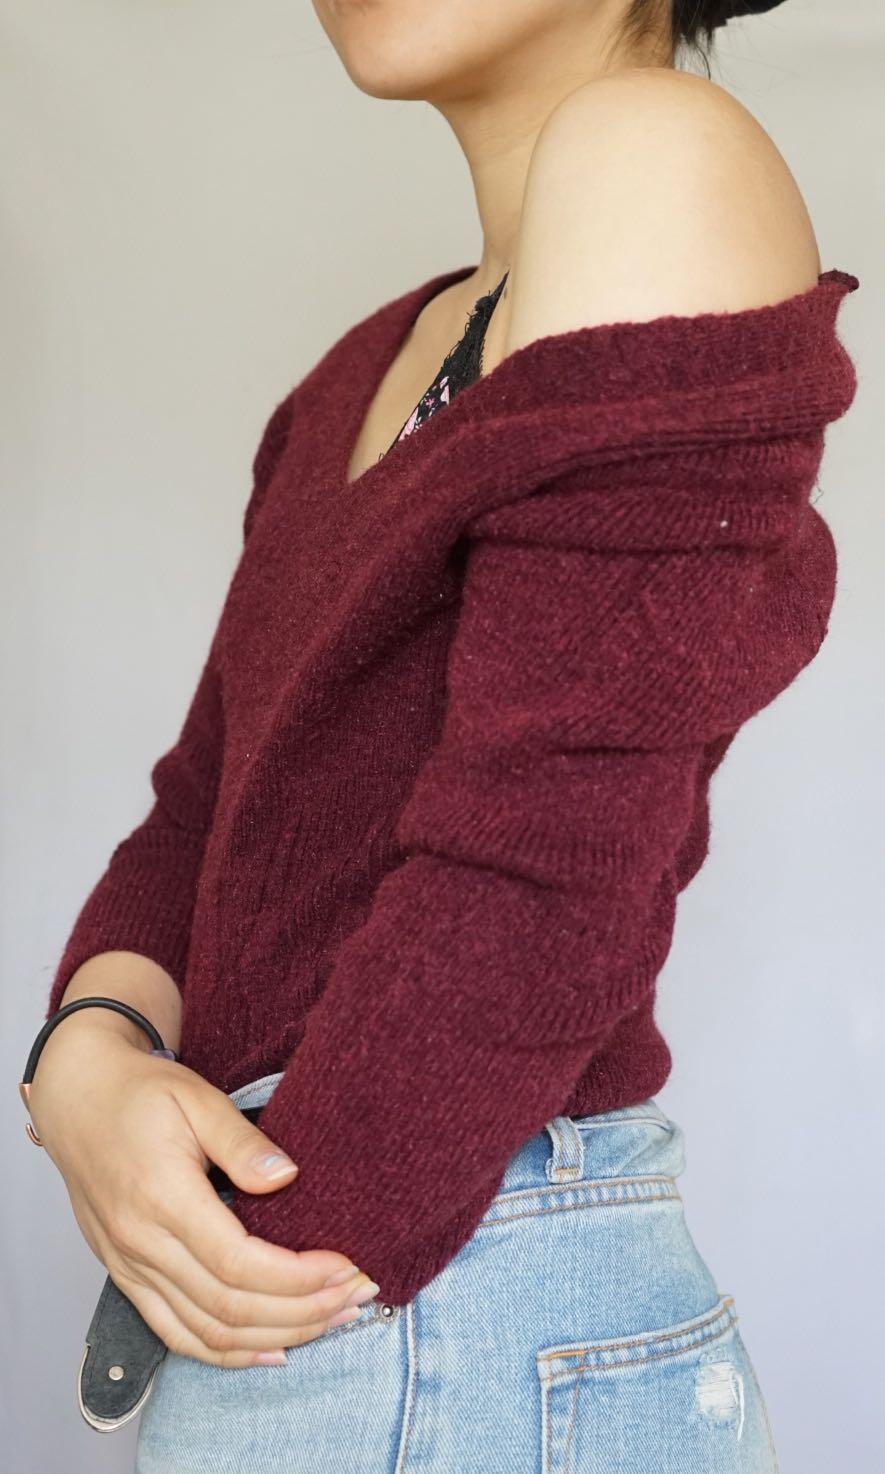 VINTAGE Versatile knit sweater